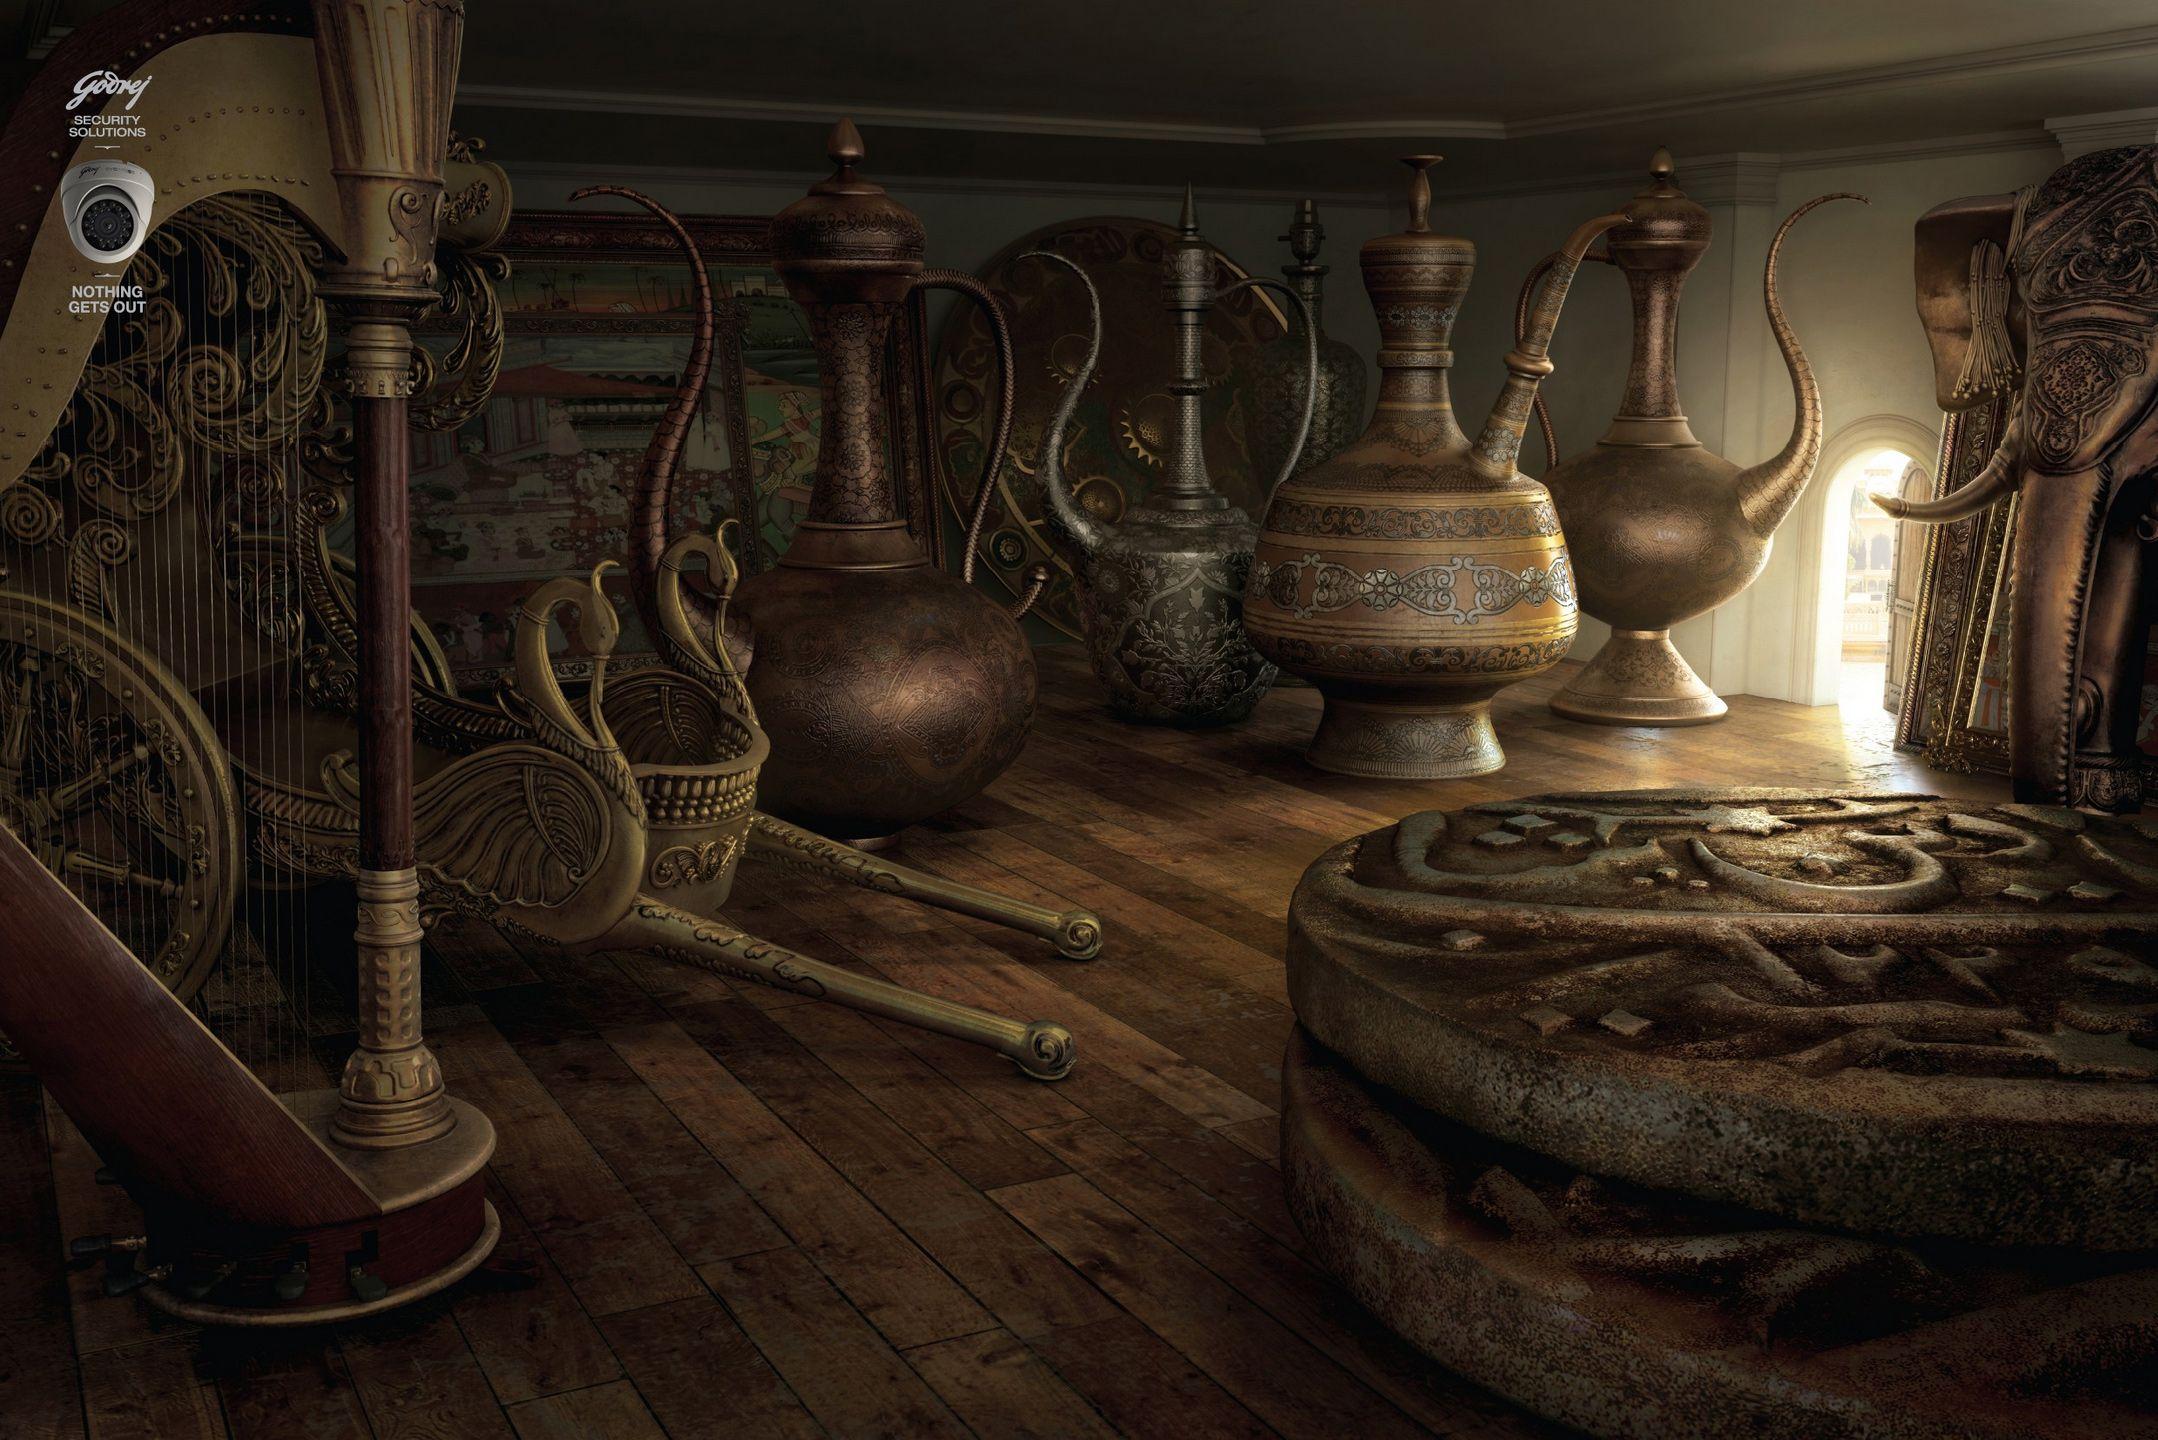 godrej security solutions antique store